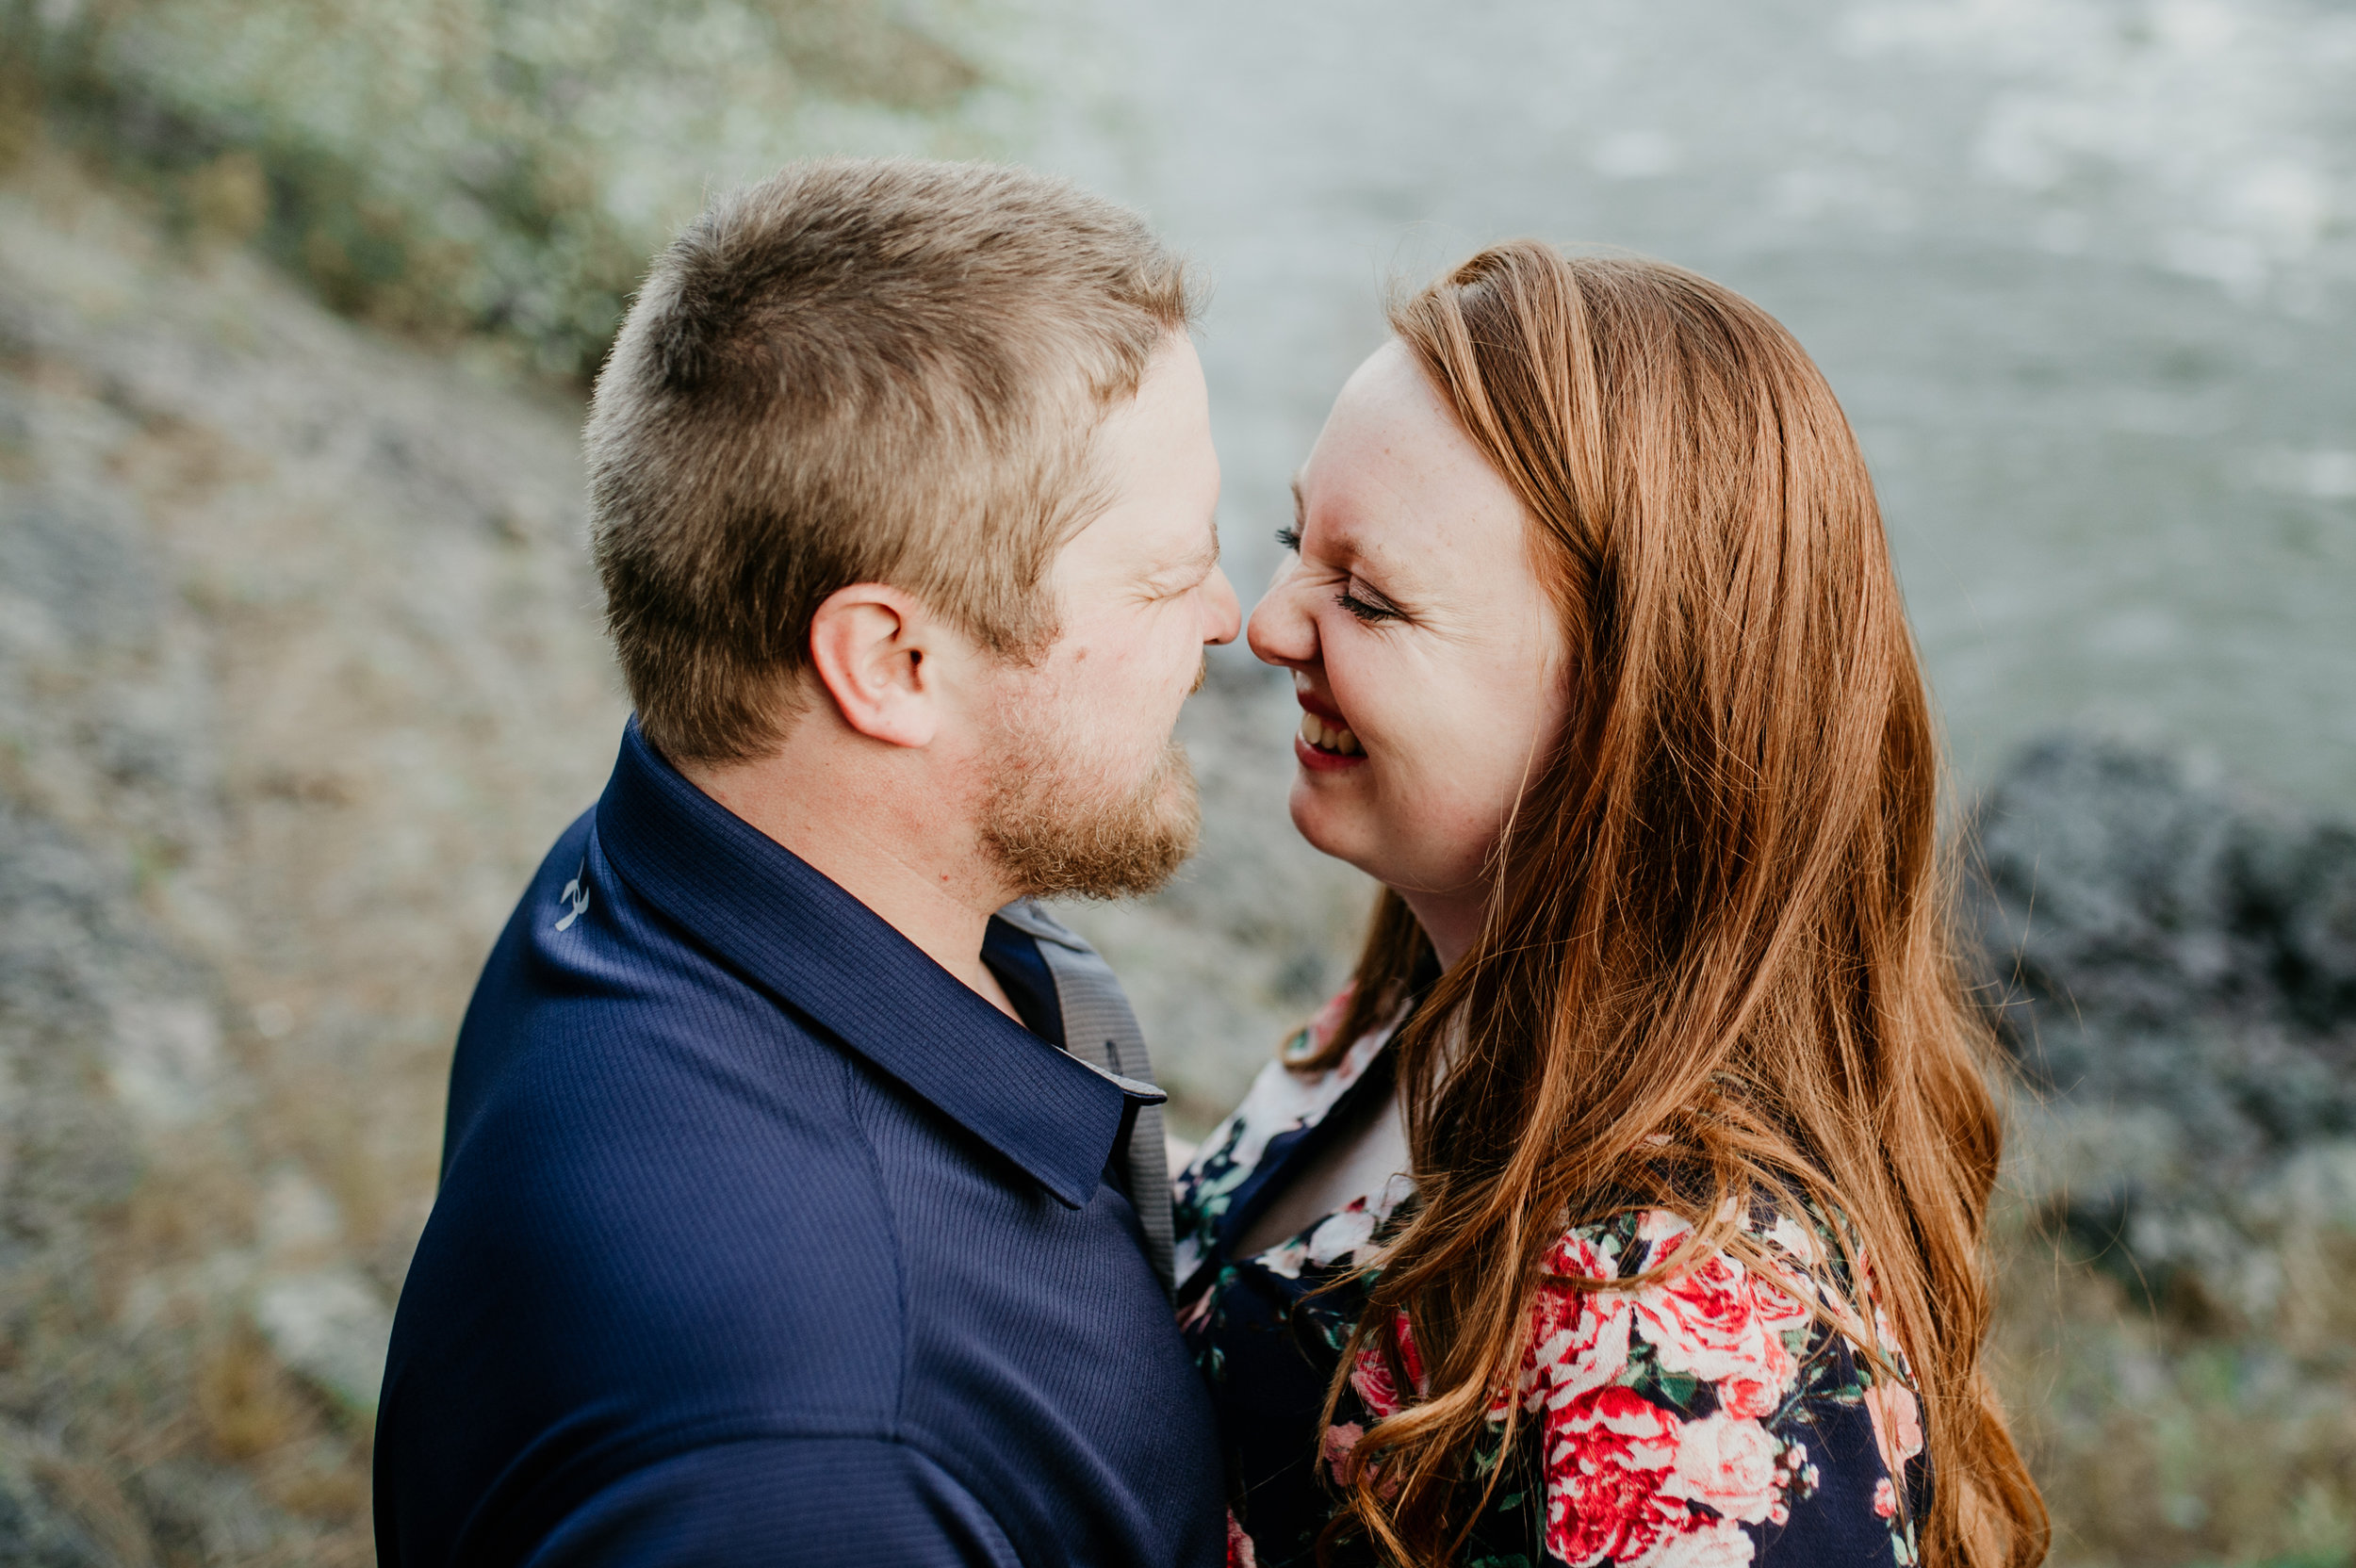 206White Raven Engagement Session_Megan & Justin_Honeybee Weddings_May 10, 2019-597.jpg